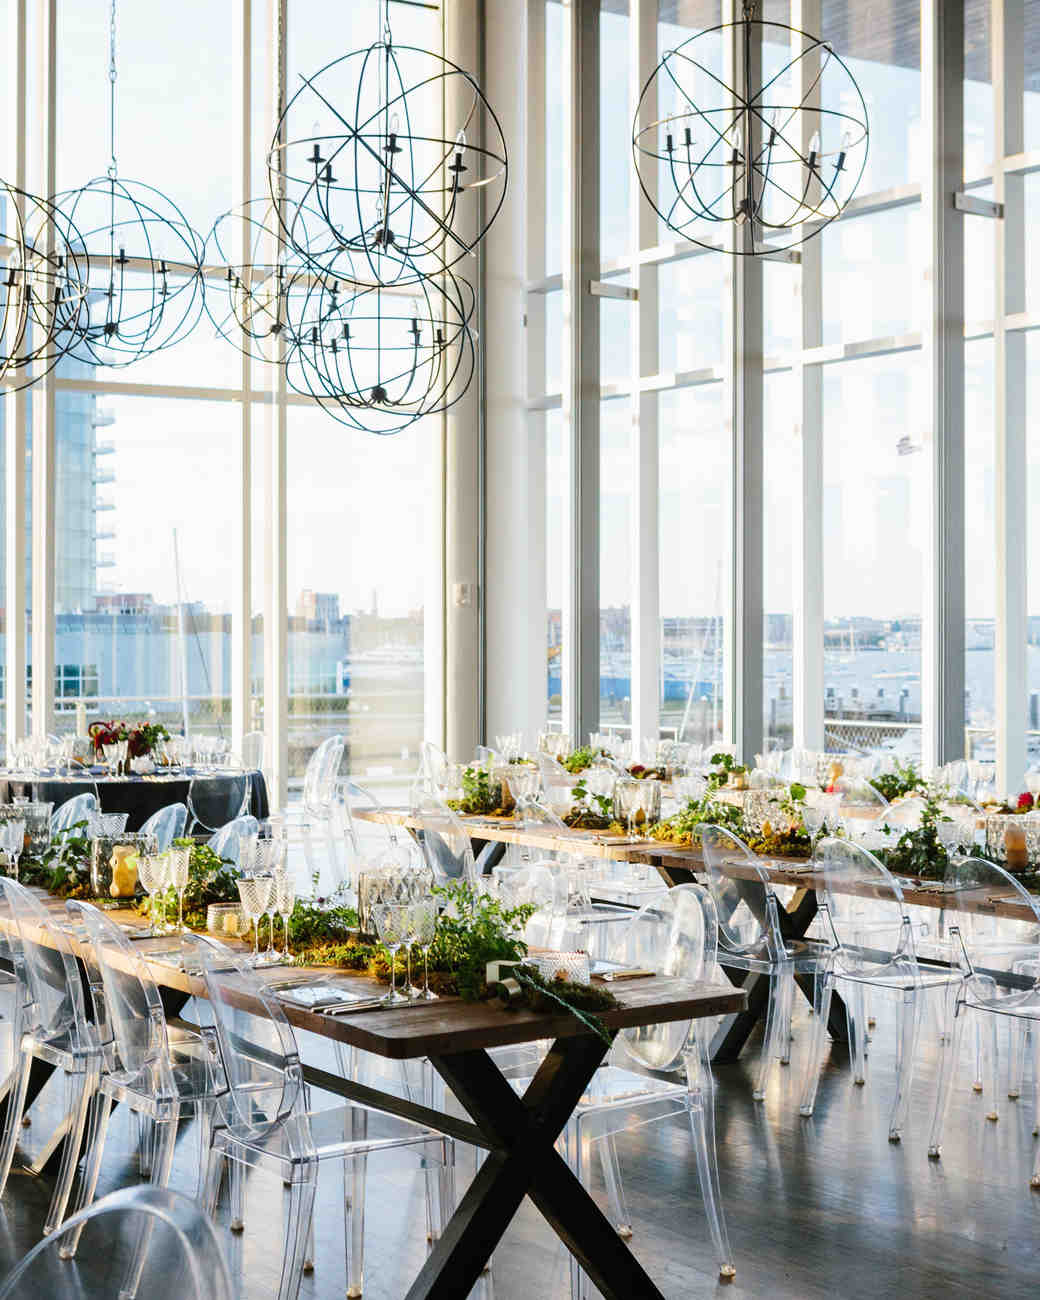 danielle-brian-wedding-reception-0725-s113001-0616.jpg